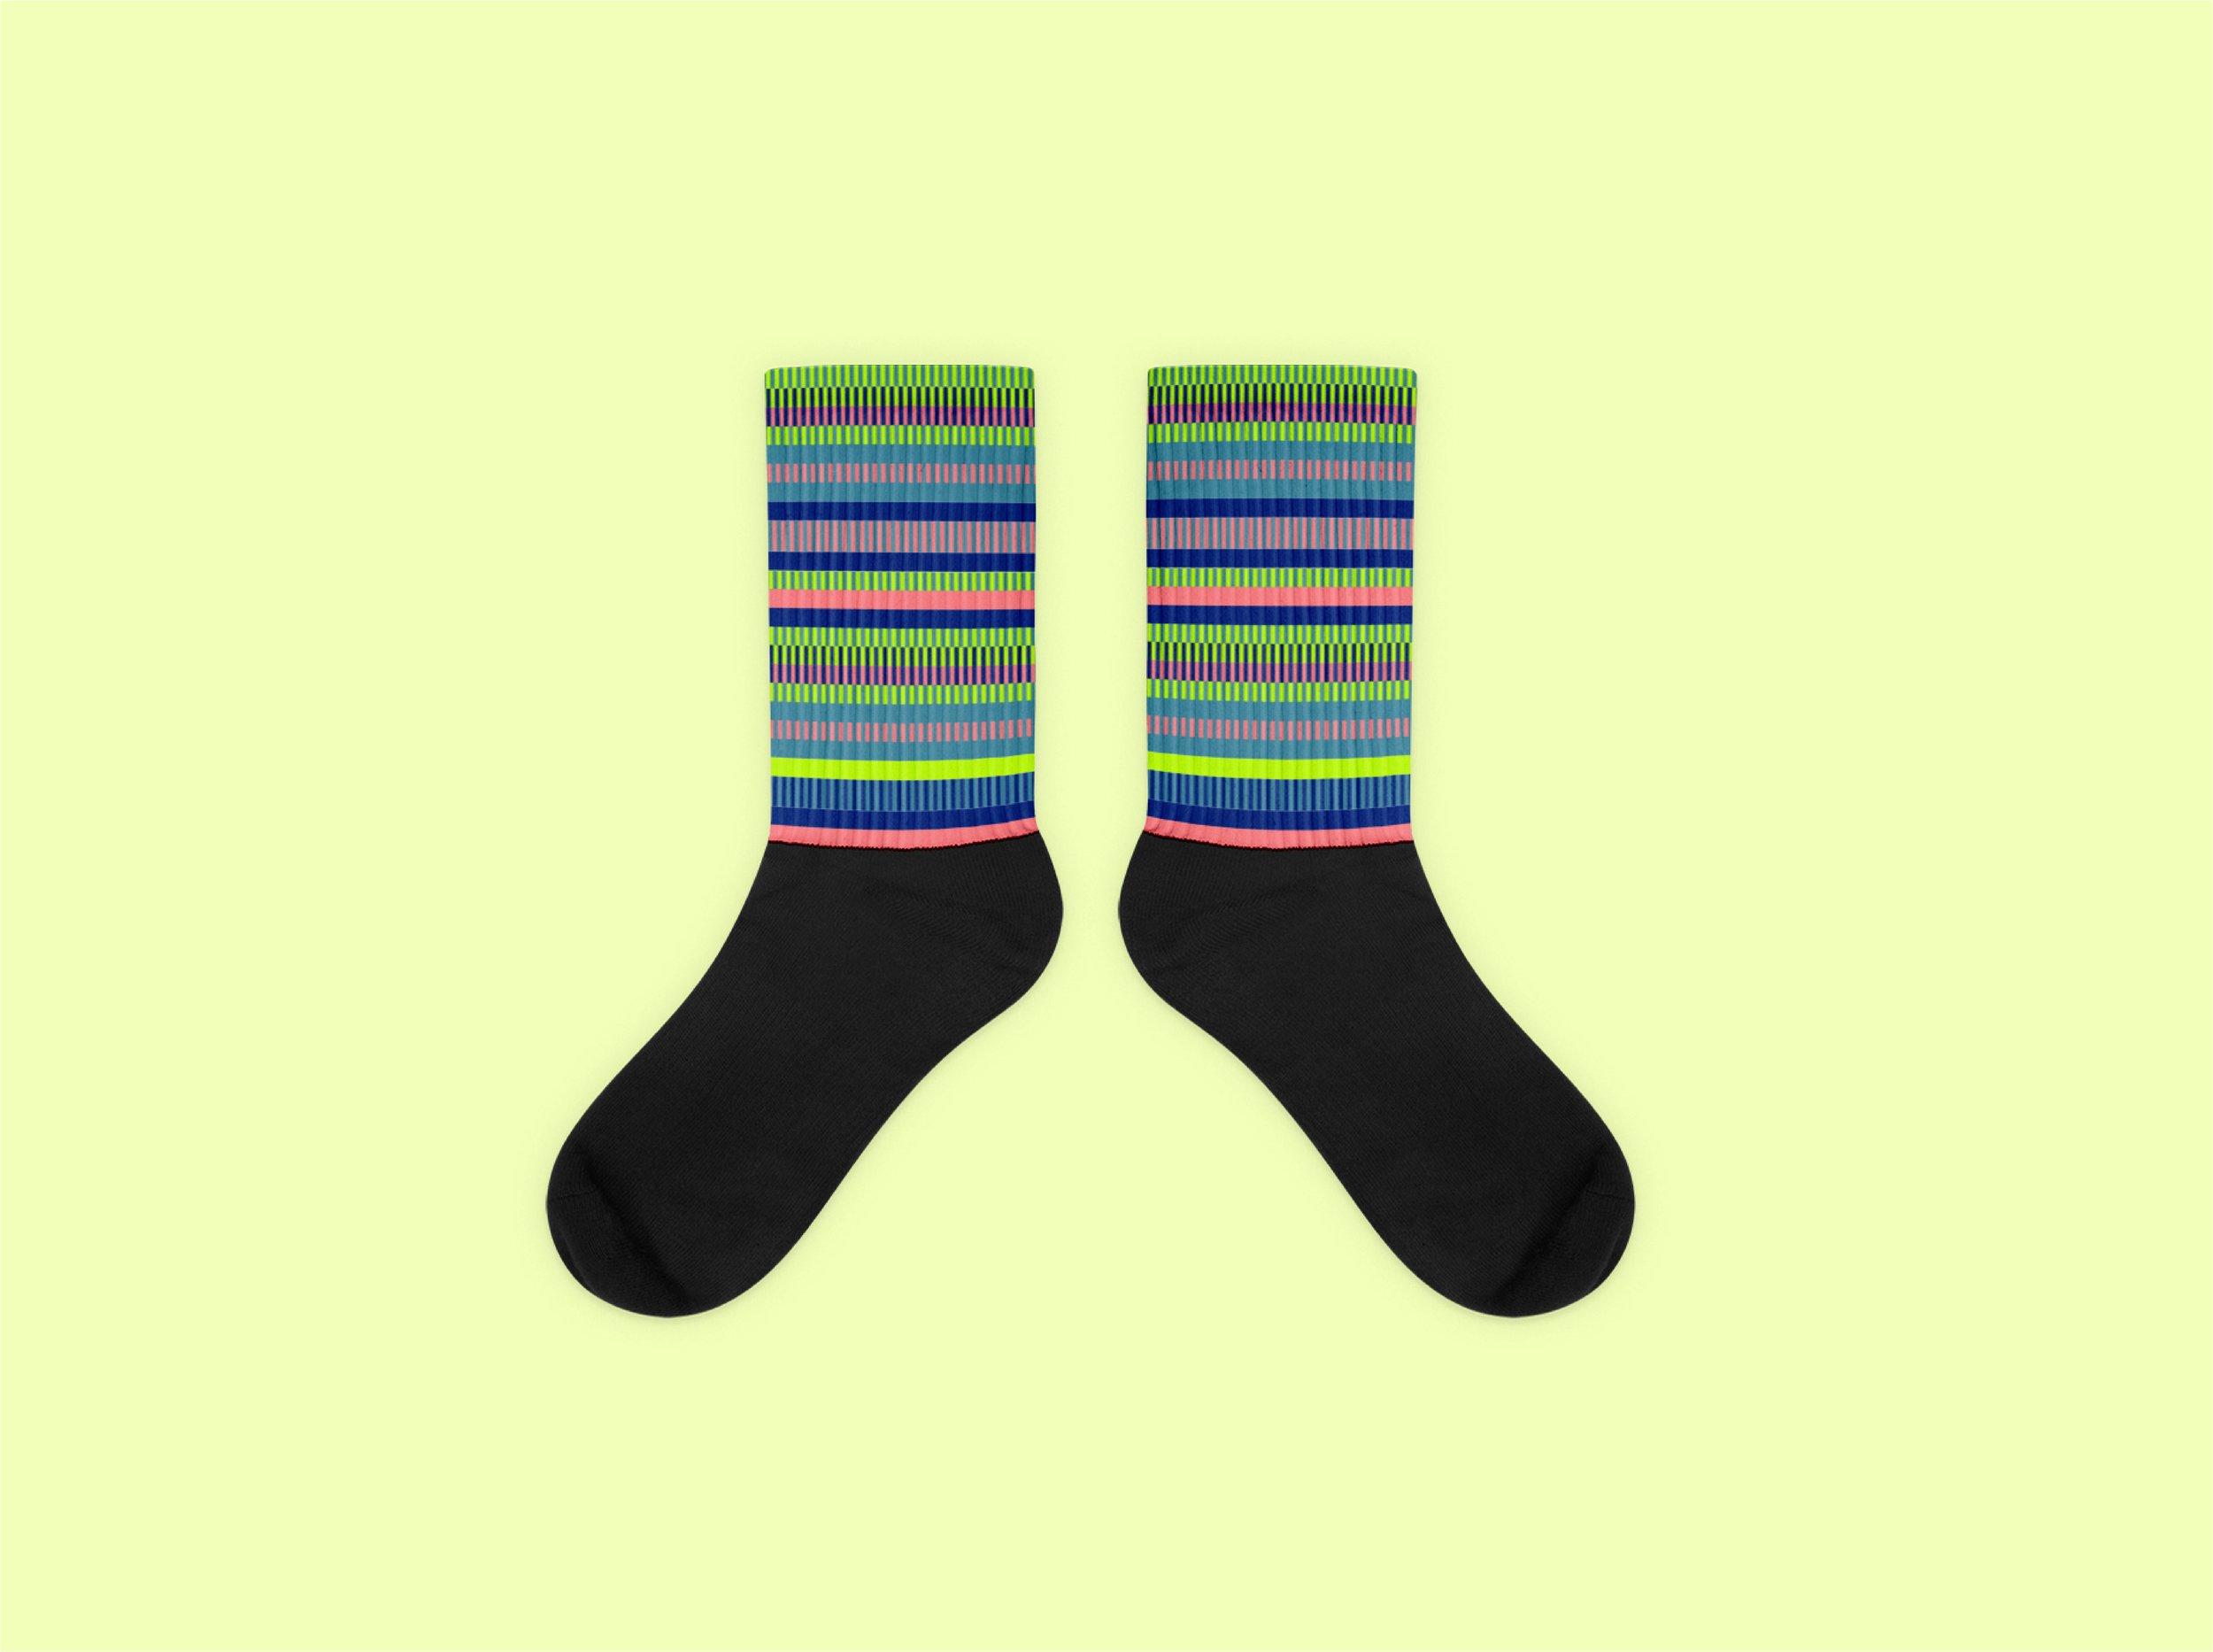 socks web-16.jpg